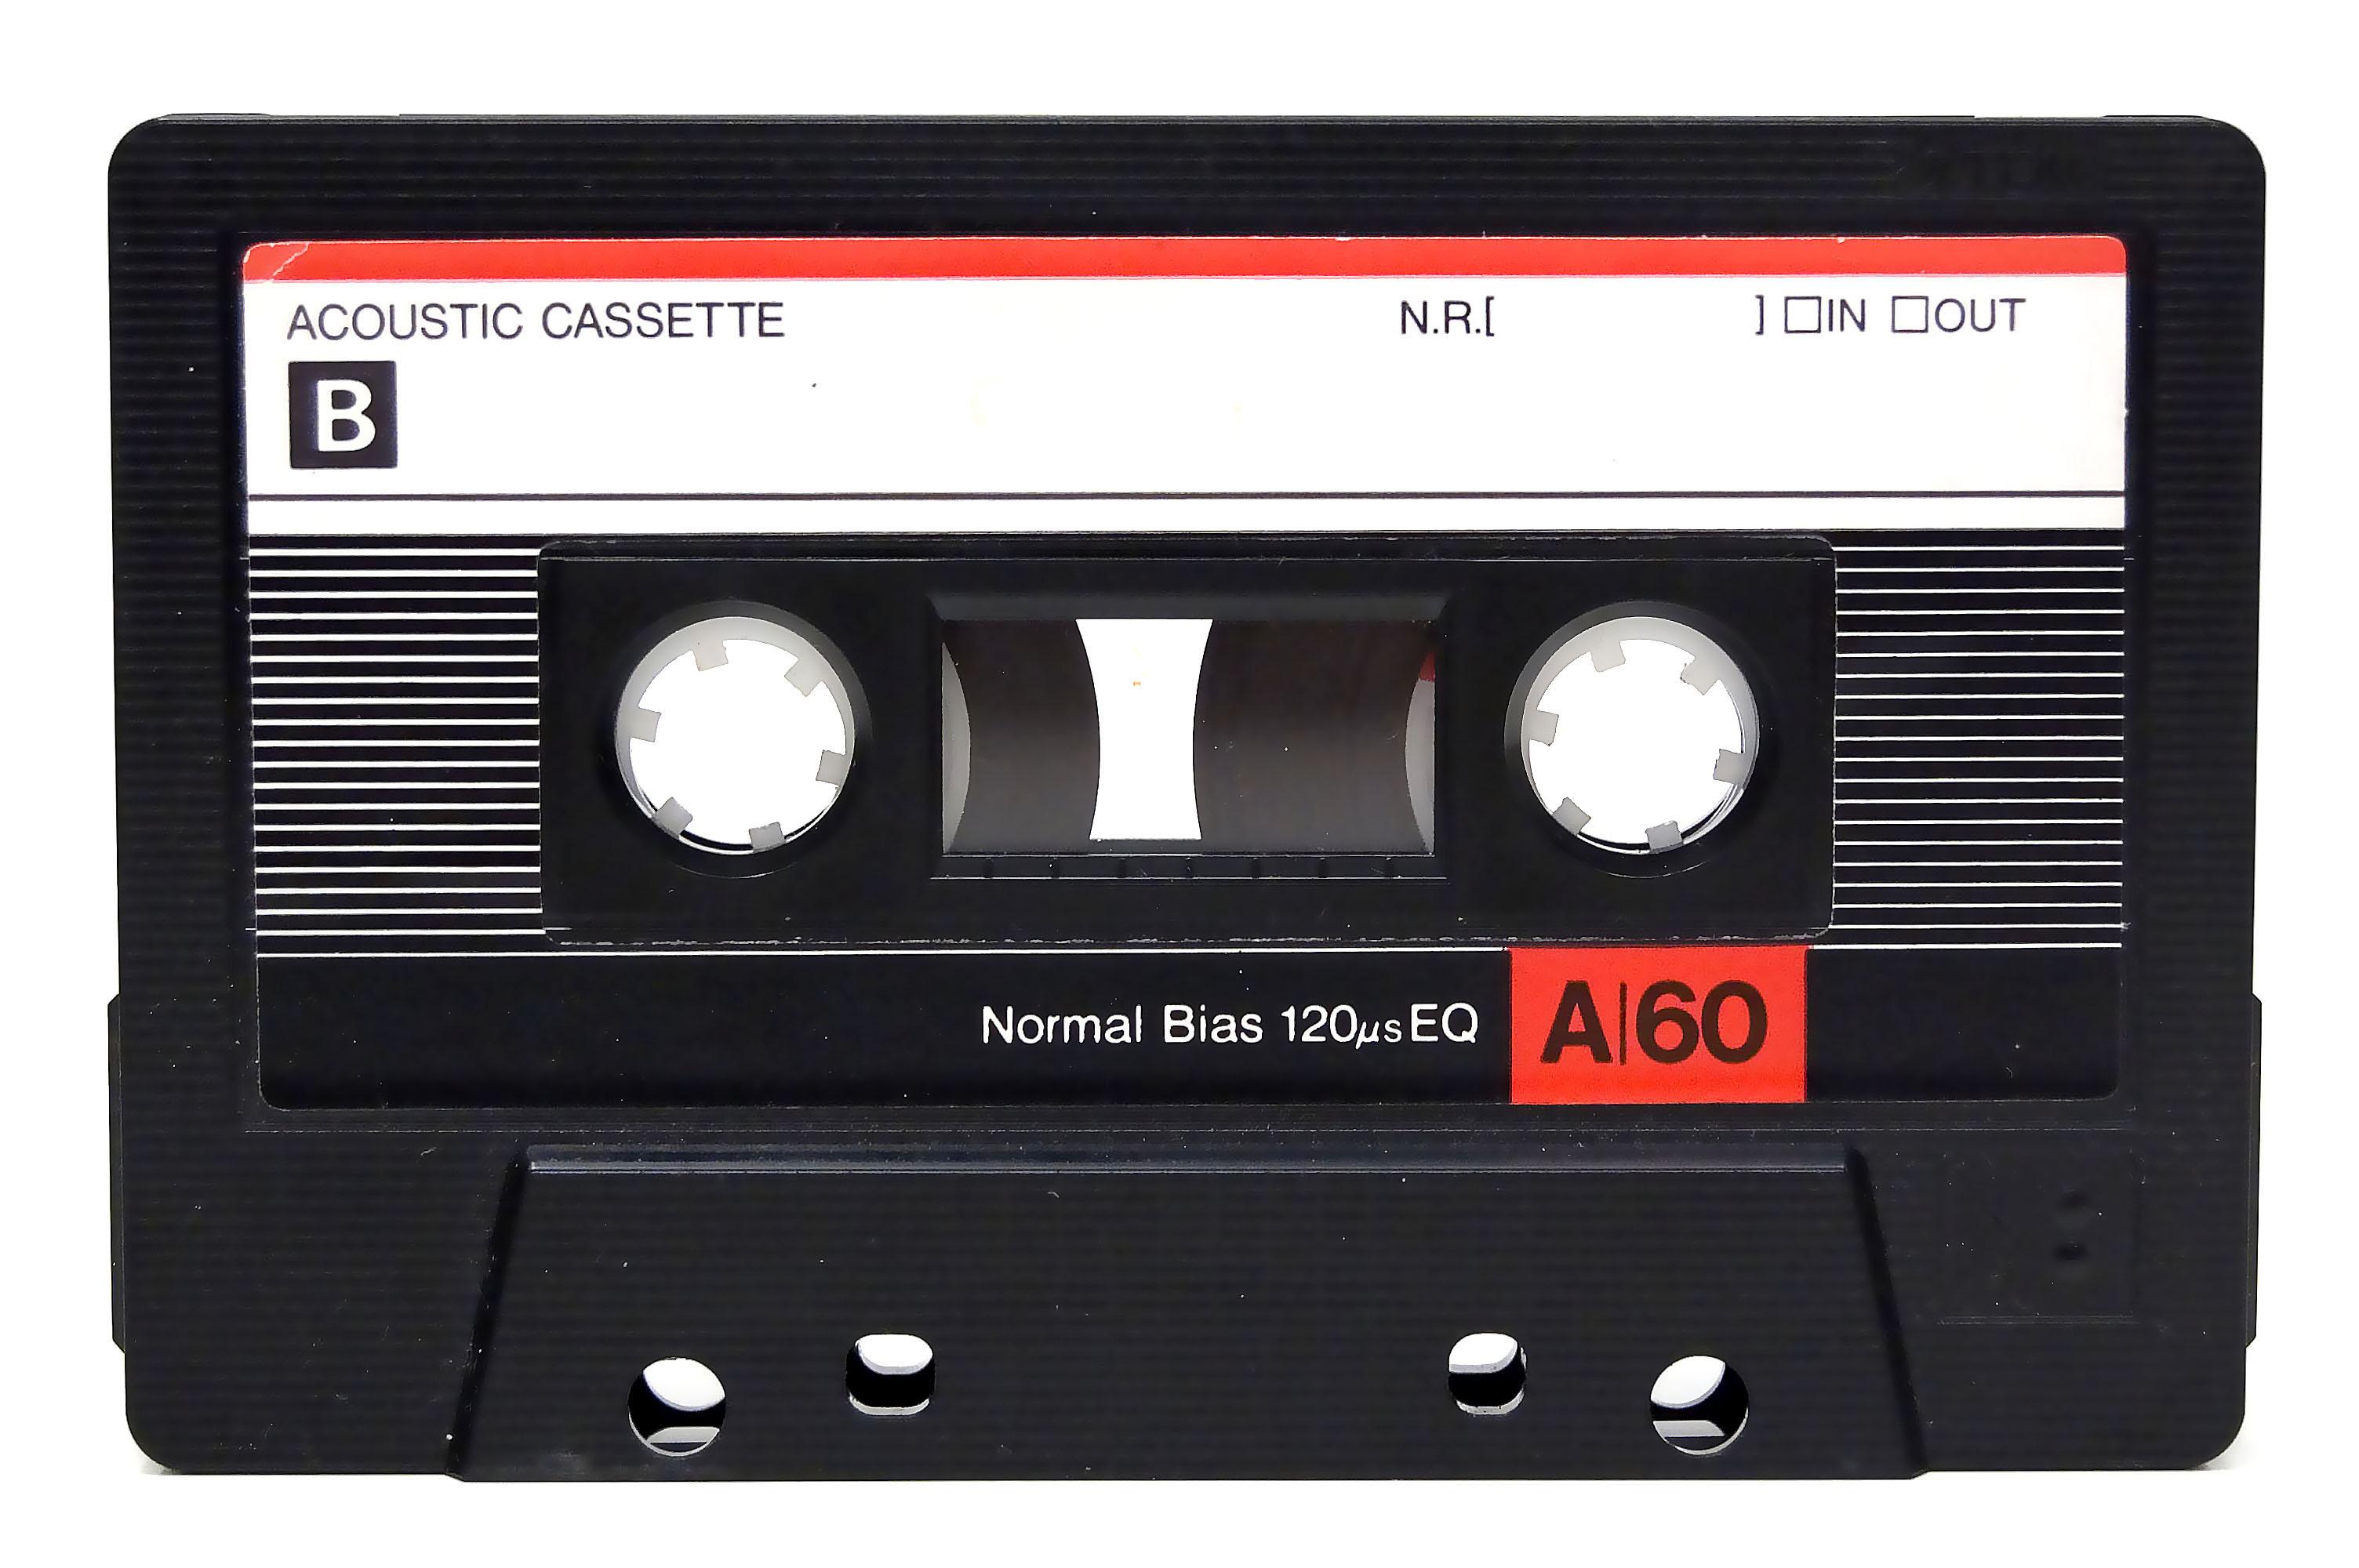 Casette HD PNG - 93857